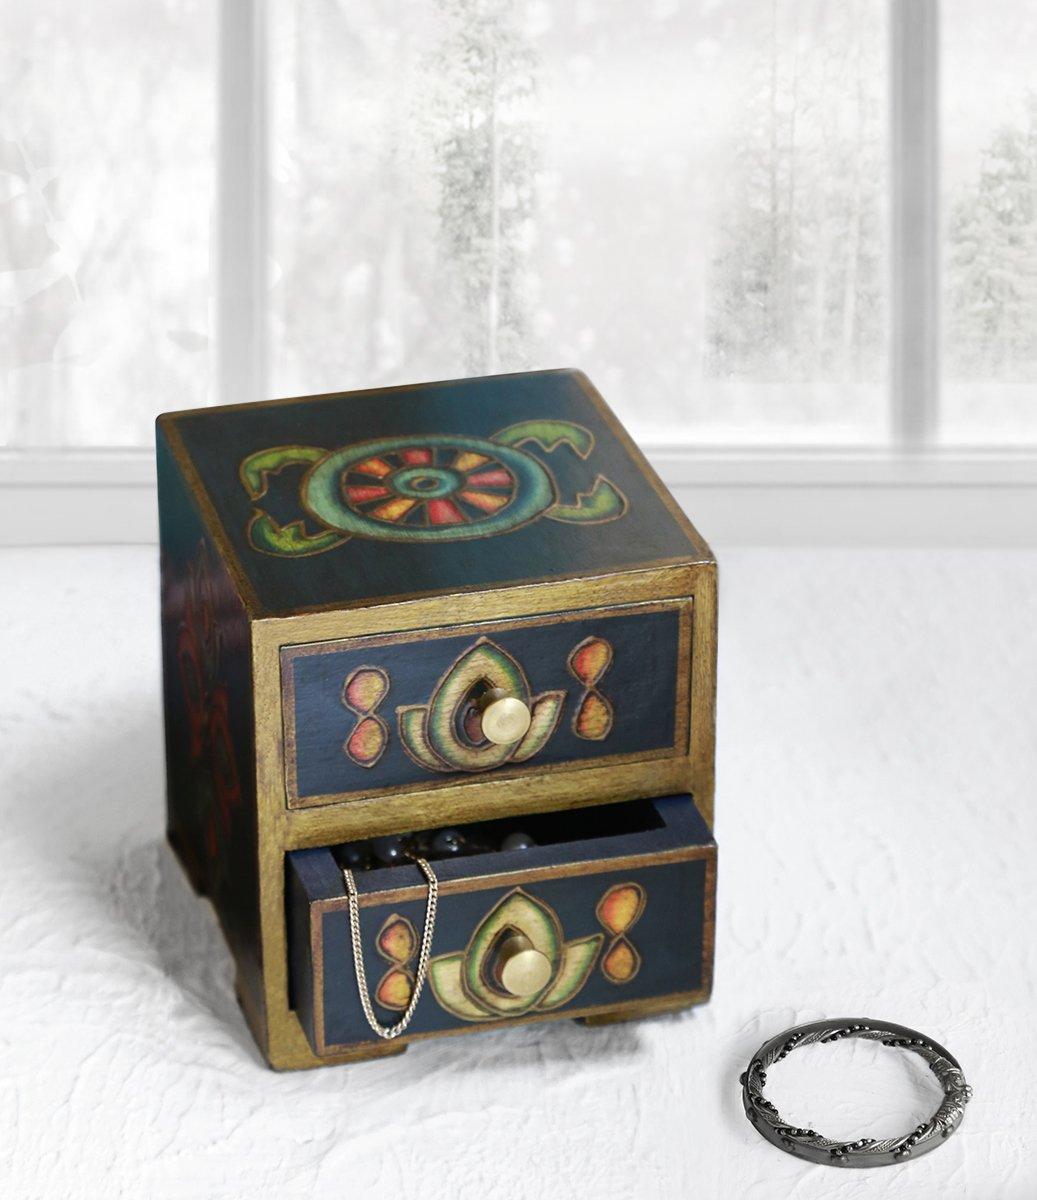 Store Indya Hand painted Keepsake Box Small Wooden Chest of 2 Drawers Storage Organizer Dresser Armoire Furniture with Ornate Designs, Buddhist monastery motifs, cone work